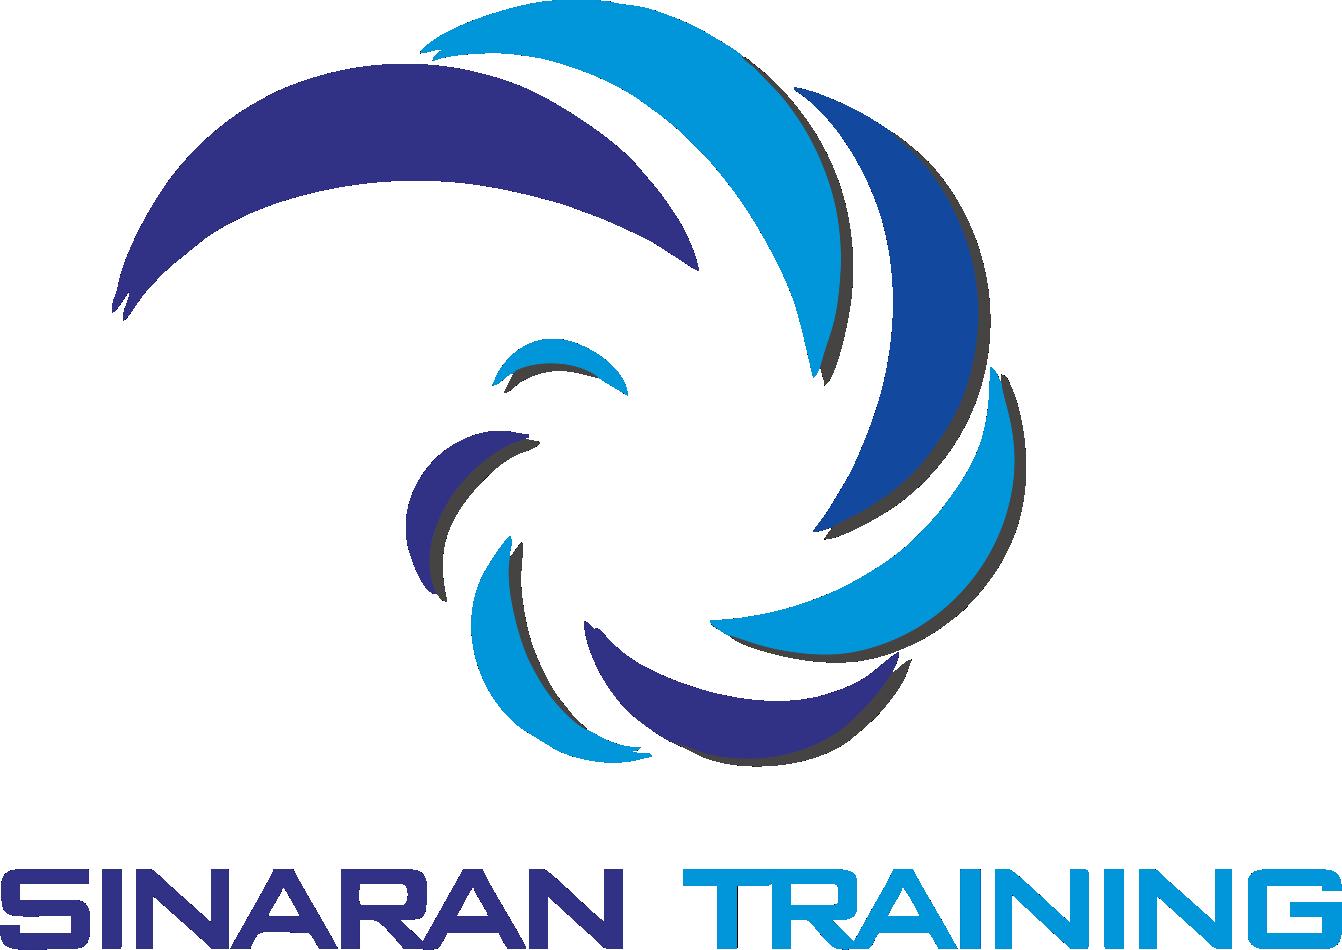 training ROTATING EQUIPMENT PUMP COMPRESSOR GAS TURBINE MAINTENANCE AND TROUBLESHOOTING,pelatihan ROTATING EQUIPMENT PUMP COMPRESSOR GAS TURBINE MAINTENANCE AND TROUBLESHOOTING,training ROTATING EQUIPMENT PUMP COMPRESSOR GAS TURBINE MAINTENANCE AND TROUBLESHOOTING Batam,training ROTATING EQUIPMENT PUMP COMPRESSOR GAS TURBINE MAINTENANCE AND TROUBLESHOOTING Bandung,training ROTATING EQUIPMENT PUMP COMPRESSOR GAS TURBINE MAINTENANCE AND TROUBLESHOOTING Jakarta,training ROTATING EQUIPMENT PUMP COMPRESSOR GAS TURBINE MAINTENANCE AND TROUBLESHOOTING Jogja,training ROTATING EQUIPMENT PUMP COMPRESSOR GAS TURBINE MAINTENANCE AND TROUBLESHOOTING Malang,training ROTATING EQUIPMENT PUMP COMPRESSOR GAS TURBINE MAINTENANCE AND TROUBLESHOOTING Surabaya,training ROTATING EQUIPMENT PUMP COMPRESSOR GAS TURBINE MAINTENANCE AND TROUBLESHOOTING Bali,training ROTATING EQUIPMENT PUMP COMPRESSOR GAS TURBINE MAINTENANCE AND TROUBLESHOOTING Lombok,pelatihan ROTATING EQUIPMENT PUMP COMPRESSOR GAS TURBINE MAINTENANCE AND TROUBLESHOOTING Batam,pelatihan ROTATING EQUIPMENT PUMP COMPRESSOR GAS TURBINE MAINTENANCE AND TROUBLESHOOTING Bandung,pelatihan ROTATING EQUIPMENT PUMP COMPRESSOR GAS TURBINE MAINTENANCE AND TROUBLESHOOTING Jakarta,pelatihan ROTATING EQUIPMENT PUMP COMPRESSOR GAS TURBINE MAINTENANCE AND TROUBLESHOOTING Jogja,pelatihan ROTATING EQUIPMENT PUMP COMPRESSOR GAS TURBINE MAINTENANCE AND TROUBLESHOOTING Malang,pelatihan ROTATING EQUIPMENT PUMP COMPRESSOR GAS TURBINE MAINTENANCE AND TROUBLESHOOTING Surabaya,pelatihan ROTATING EQUIPMENT PUMP COMPRESSOR GAS TURBINE MAINTENANCE AND TROUBLESHOOTING Bali,pelatihan ROTATING EQUIPMENT PUMP COMPRESSOR GAS TURBINE MAINTENANCE AND TROUBLESHOOTING Lombok